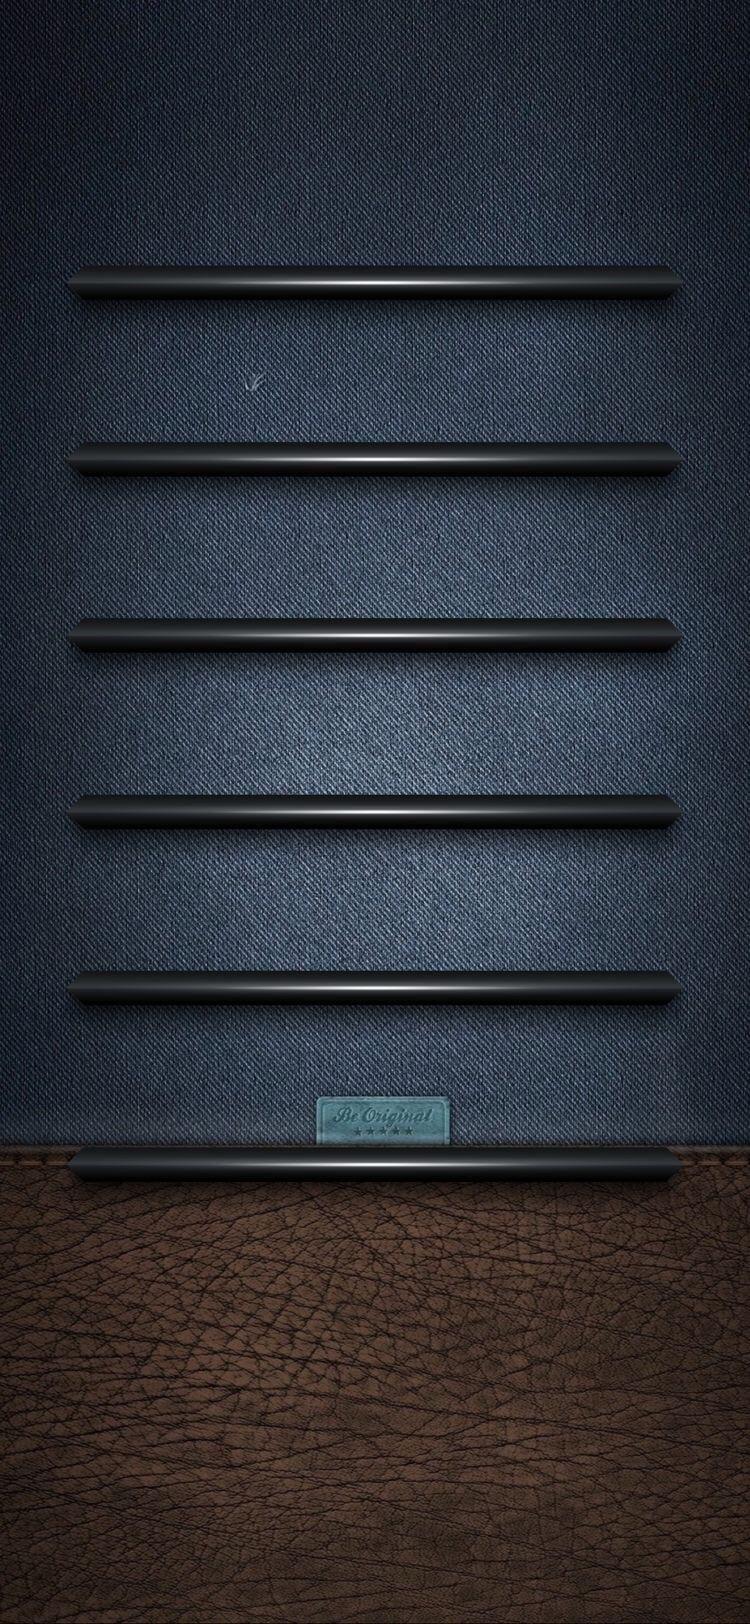 App Shelves Odor Iphone X Xs Iphone X Wallpapers